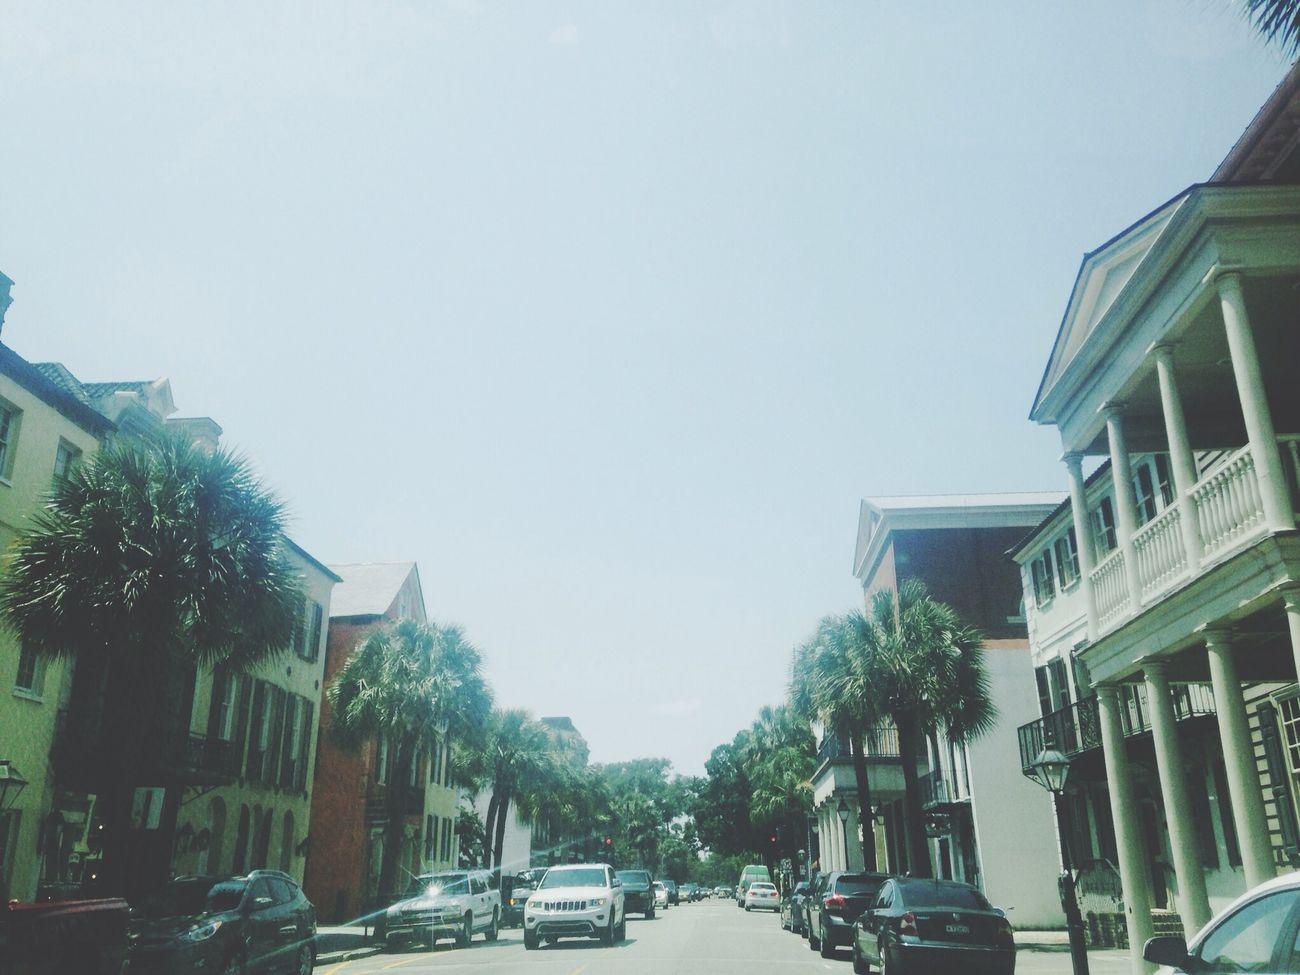 Dt Charleston. Photo by:me Instagram:legacymarie